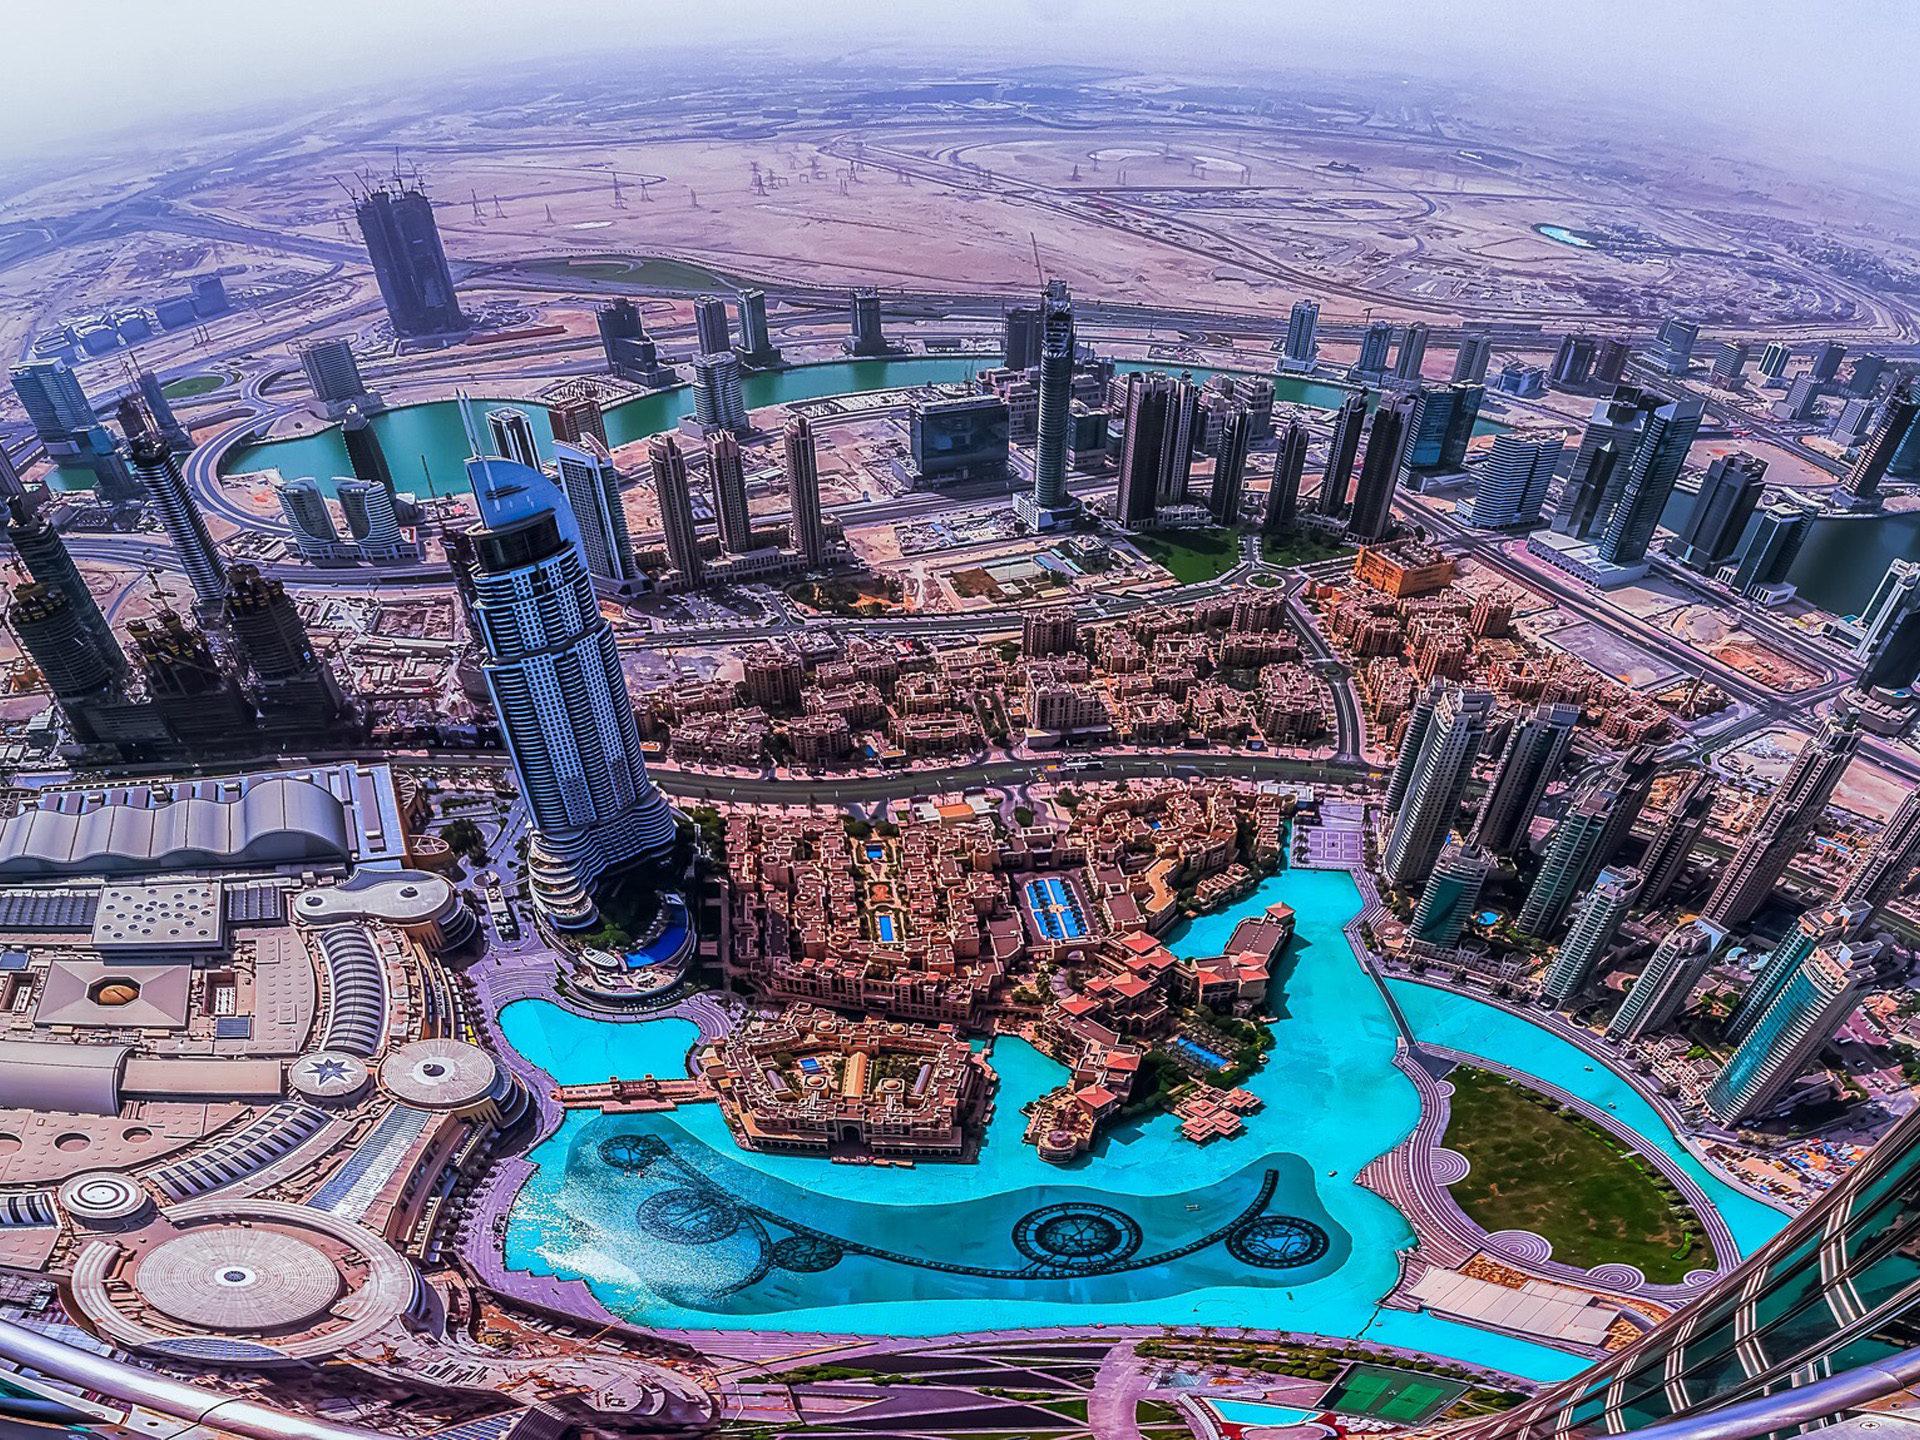 Spain Wallpaper Iphone Dubai Aerial View From The Top Of Burj Khalifa Desktop Hd